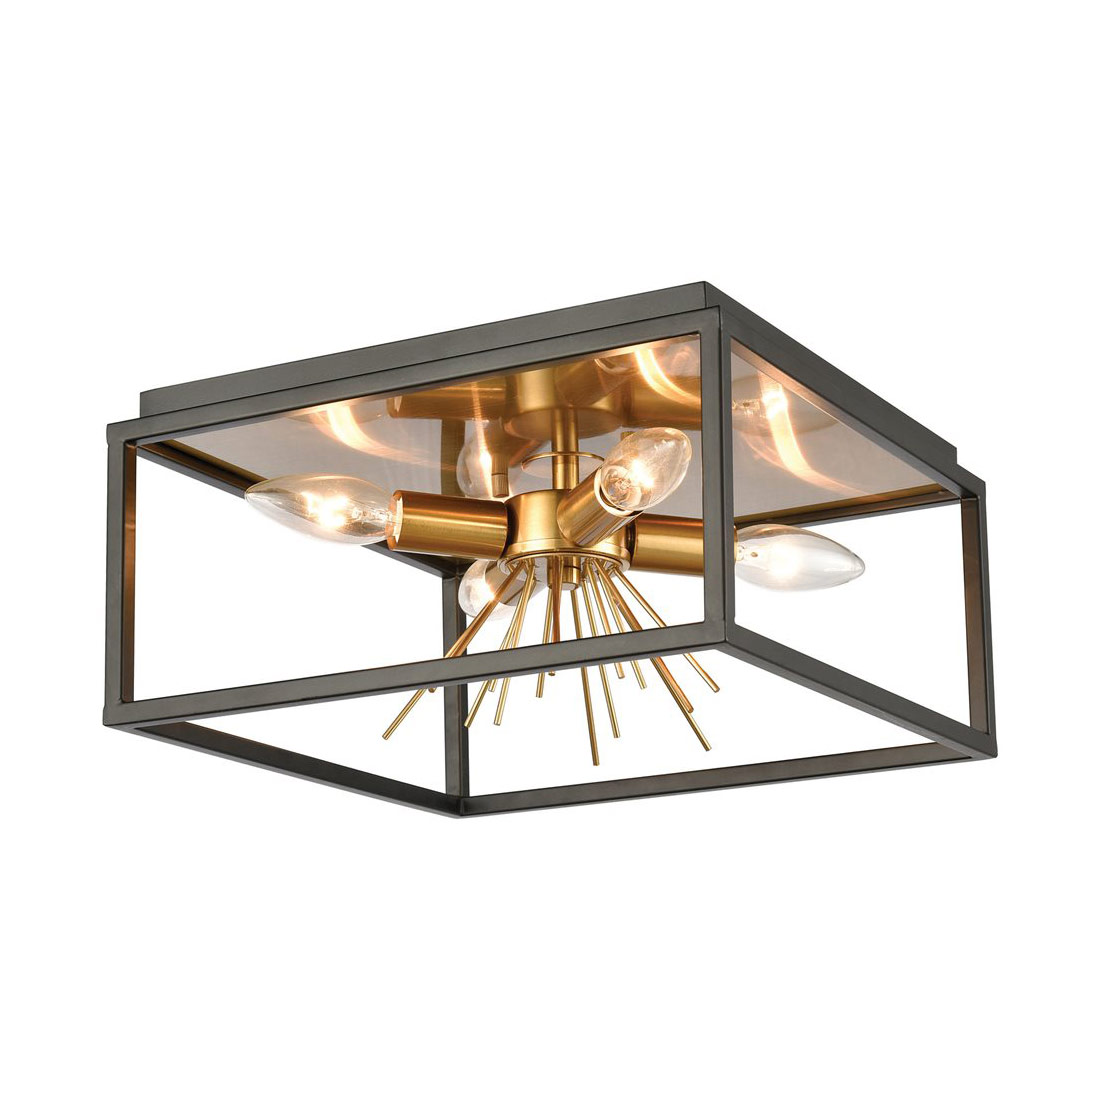 spark ceiling light fixture by elk lighting 46364 4